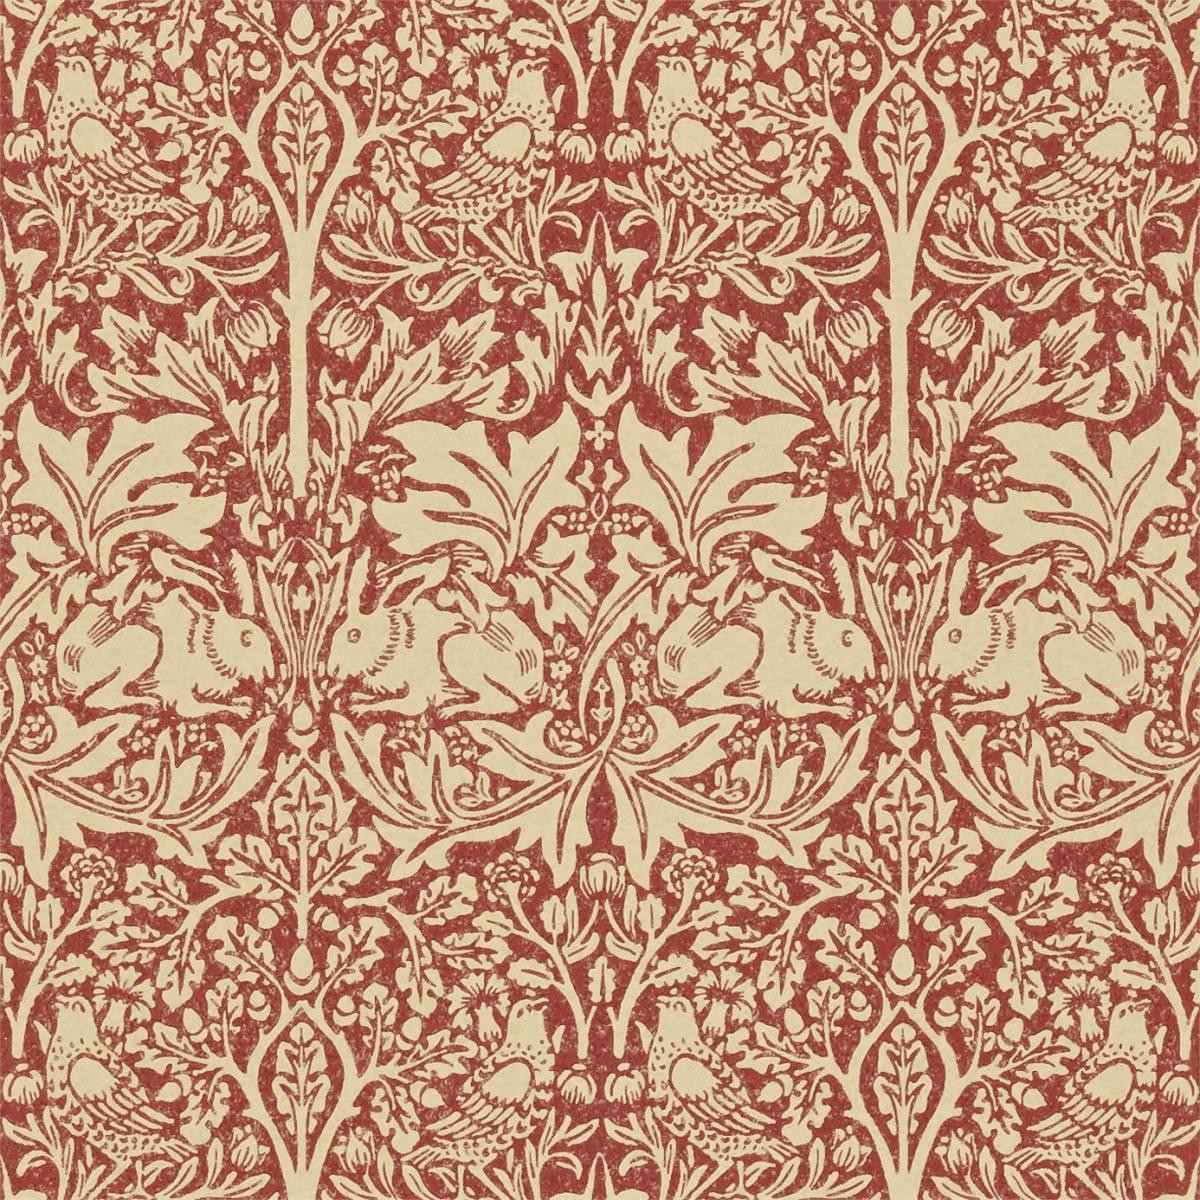 William Morris Wallpaper: Church Red/Biscuit (210410